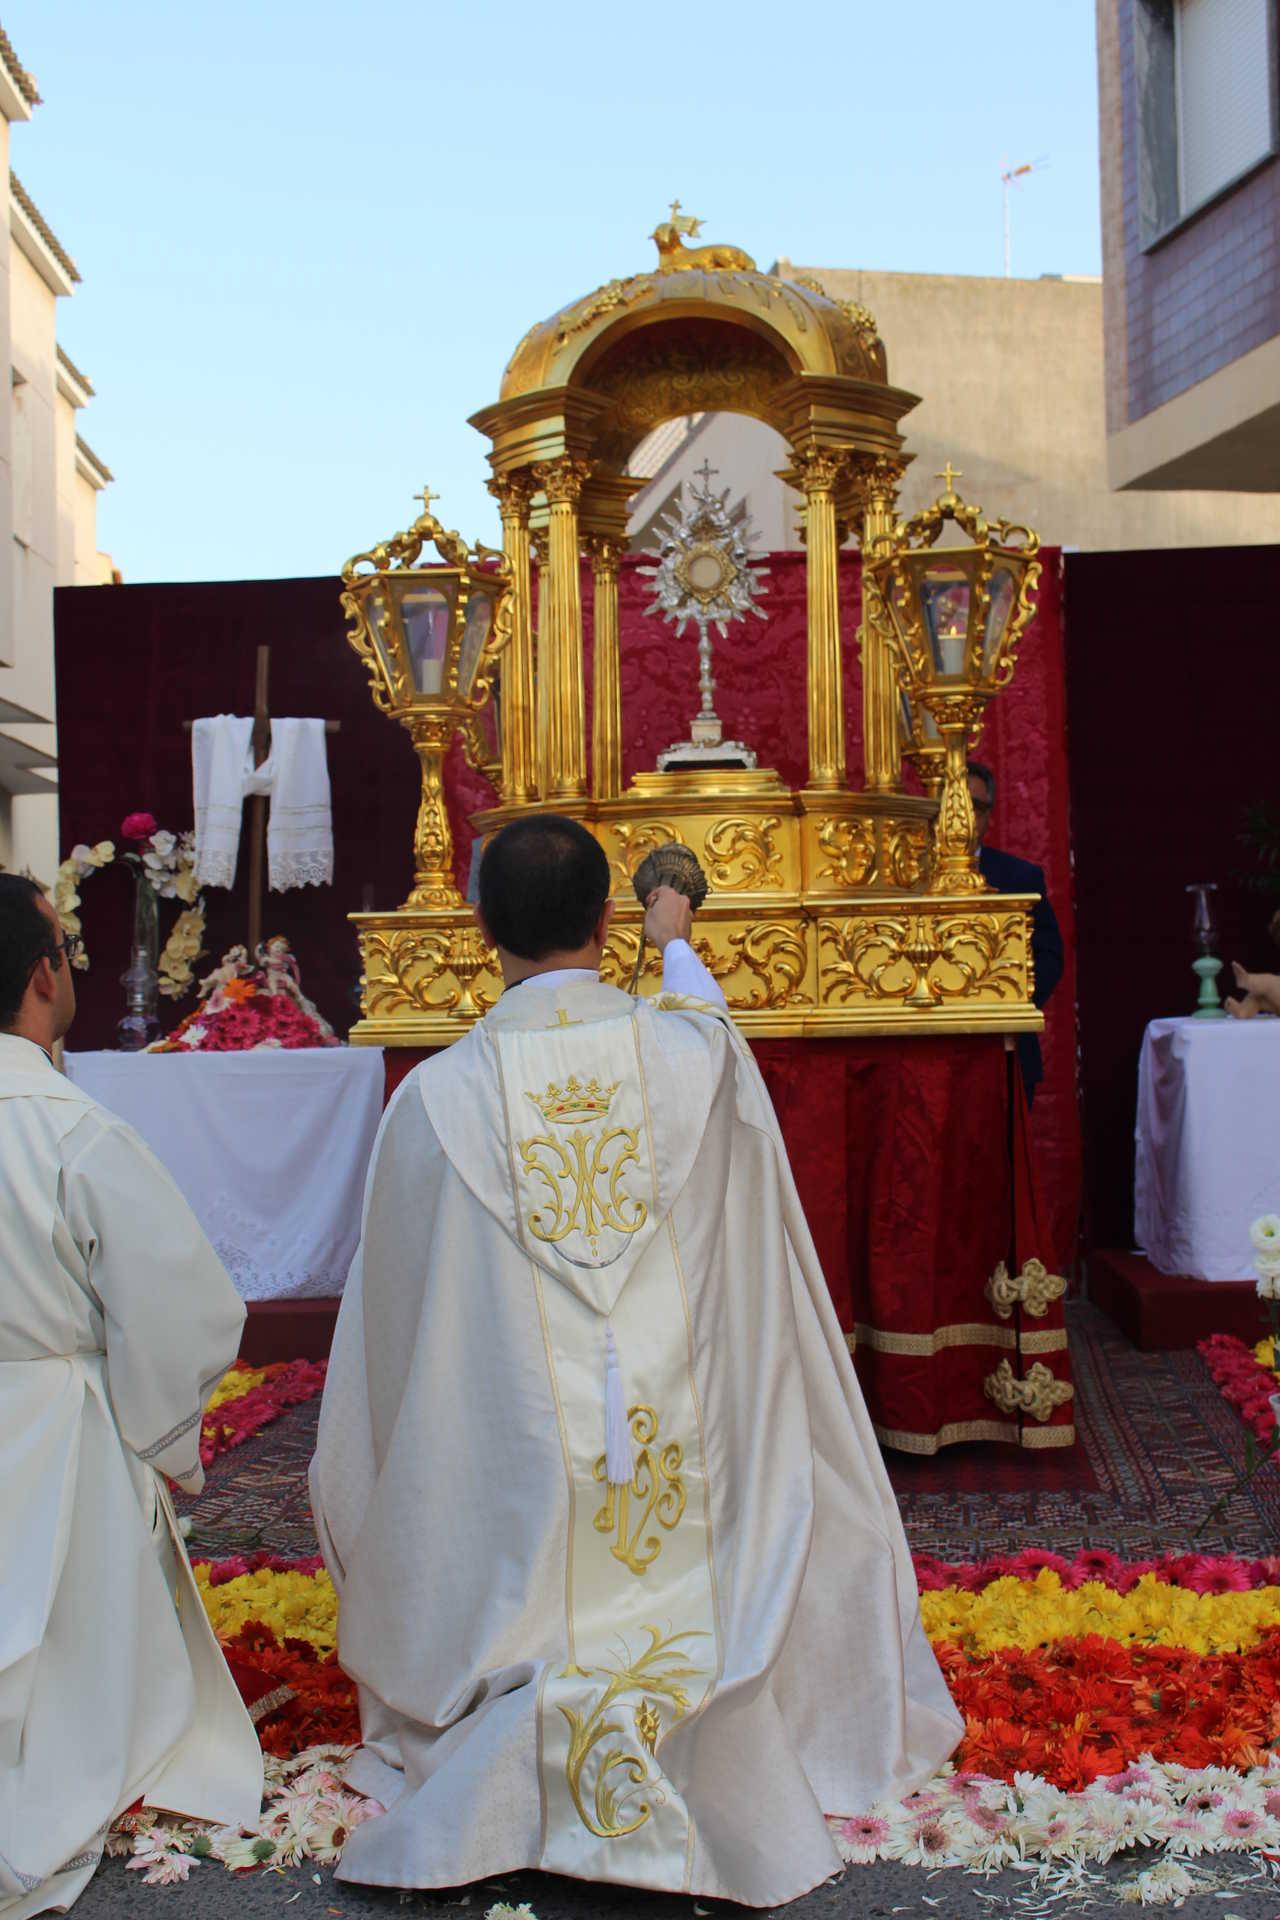 FESTIVITAT DEL CORPUS CHRISTI